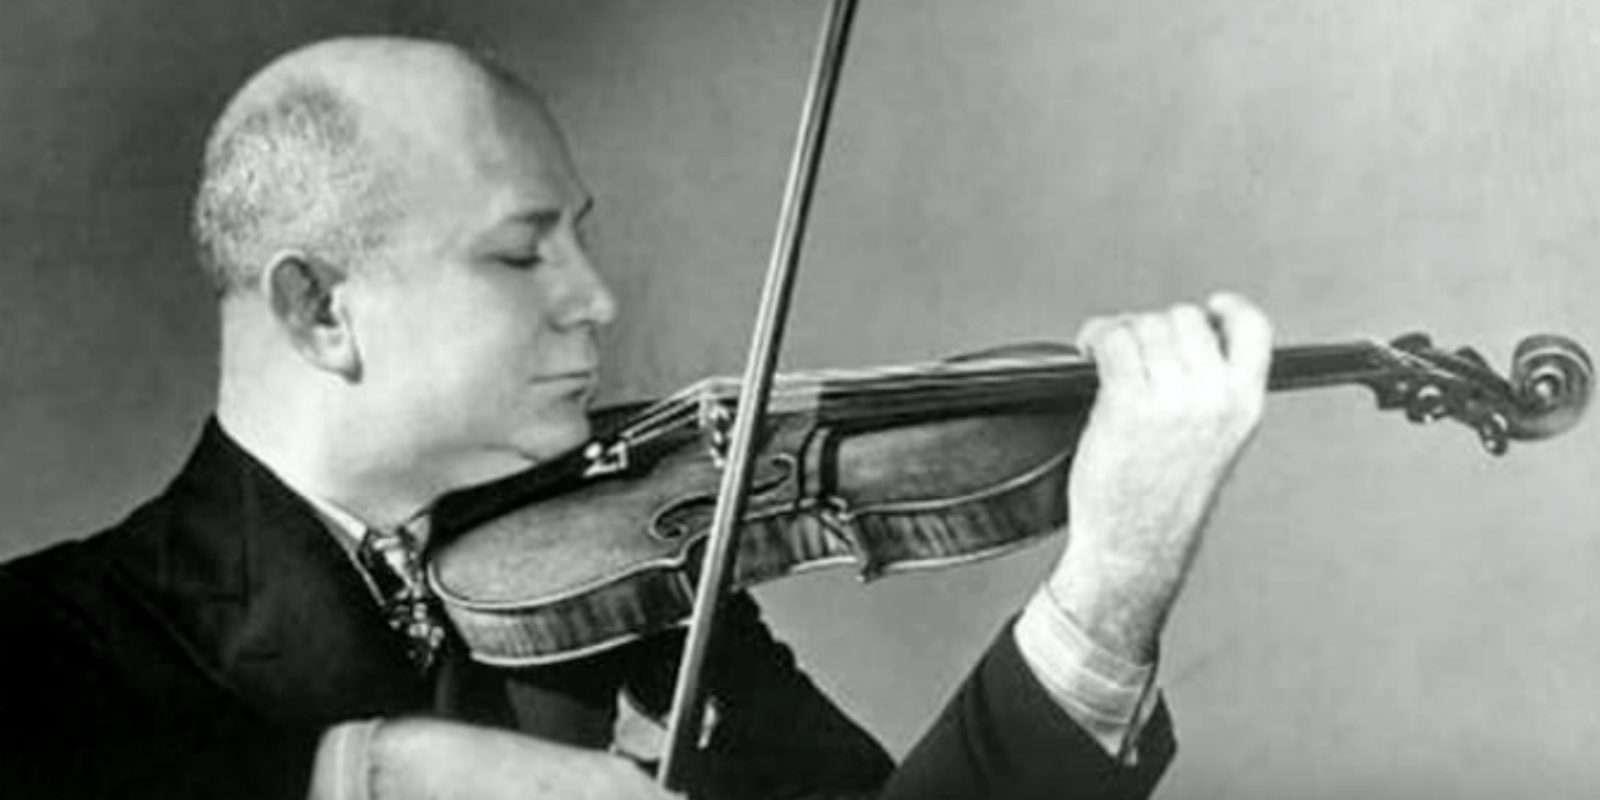 NEW TO YOUTUBE | Violinist Mischa Elman – Mendelssohn Violin Concerto [1948 ARCHIVAL]